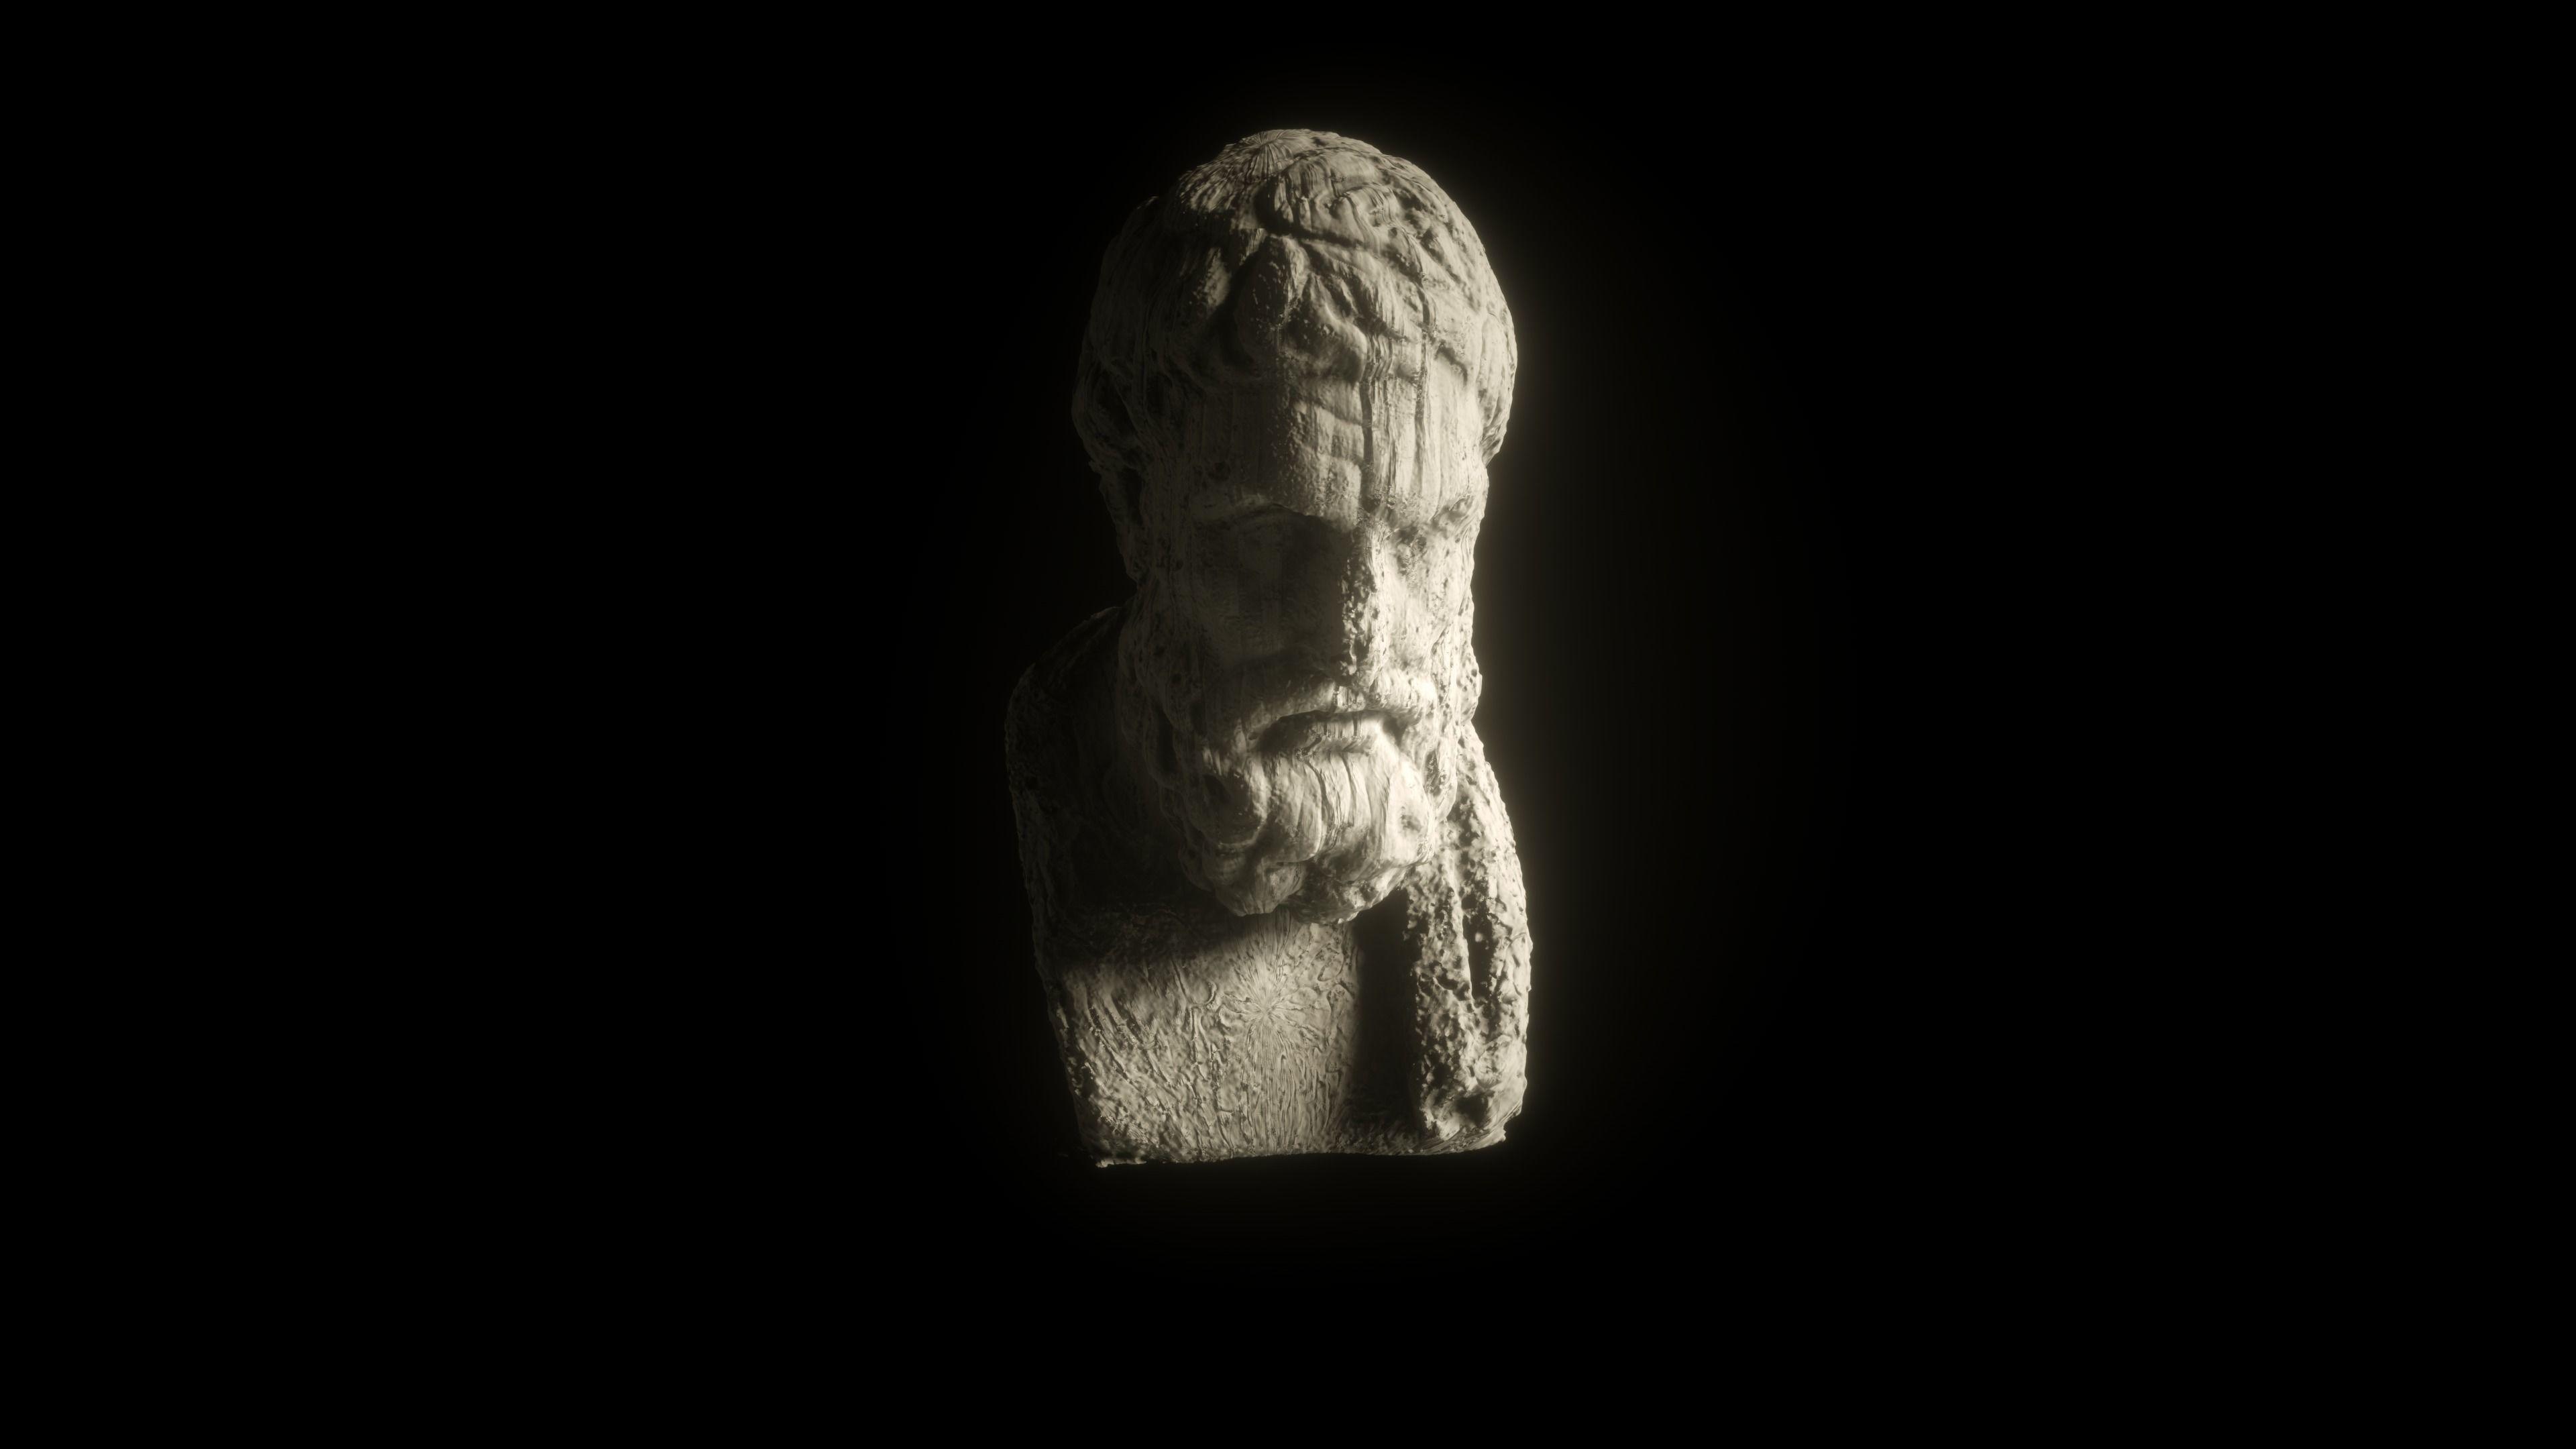 Epikur Sculpture Fotoscan By Timvias